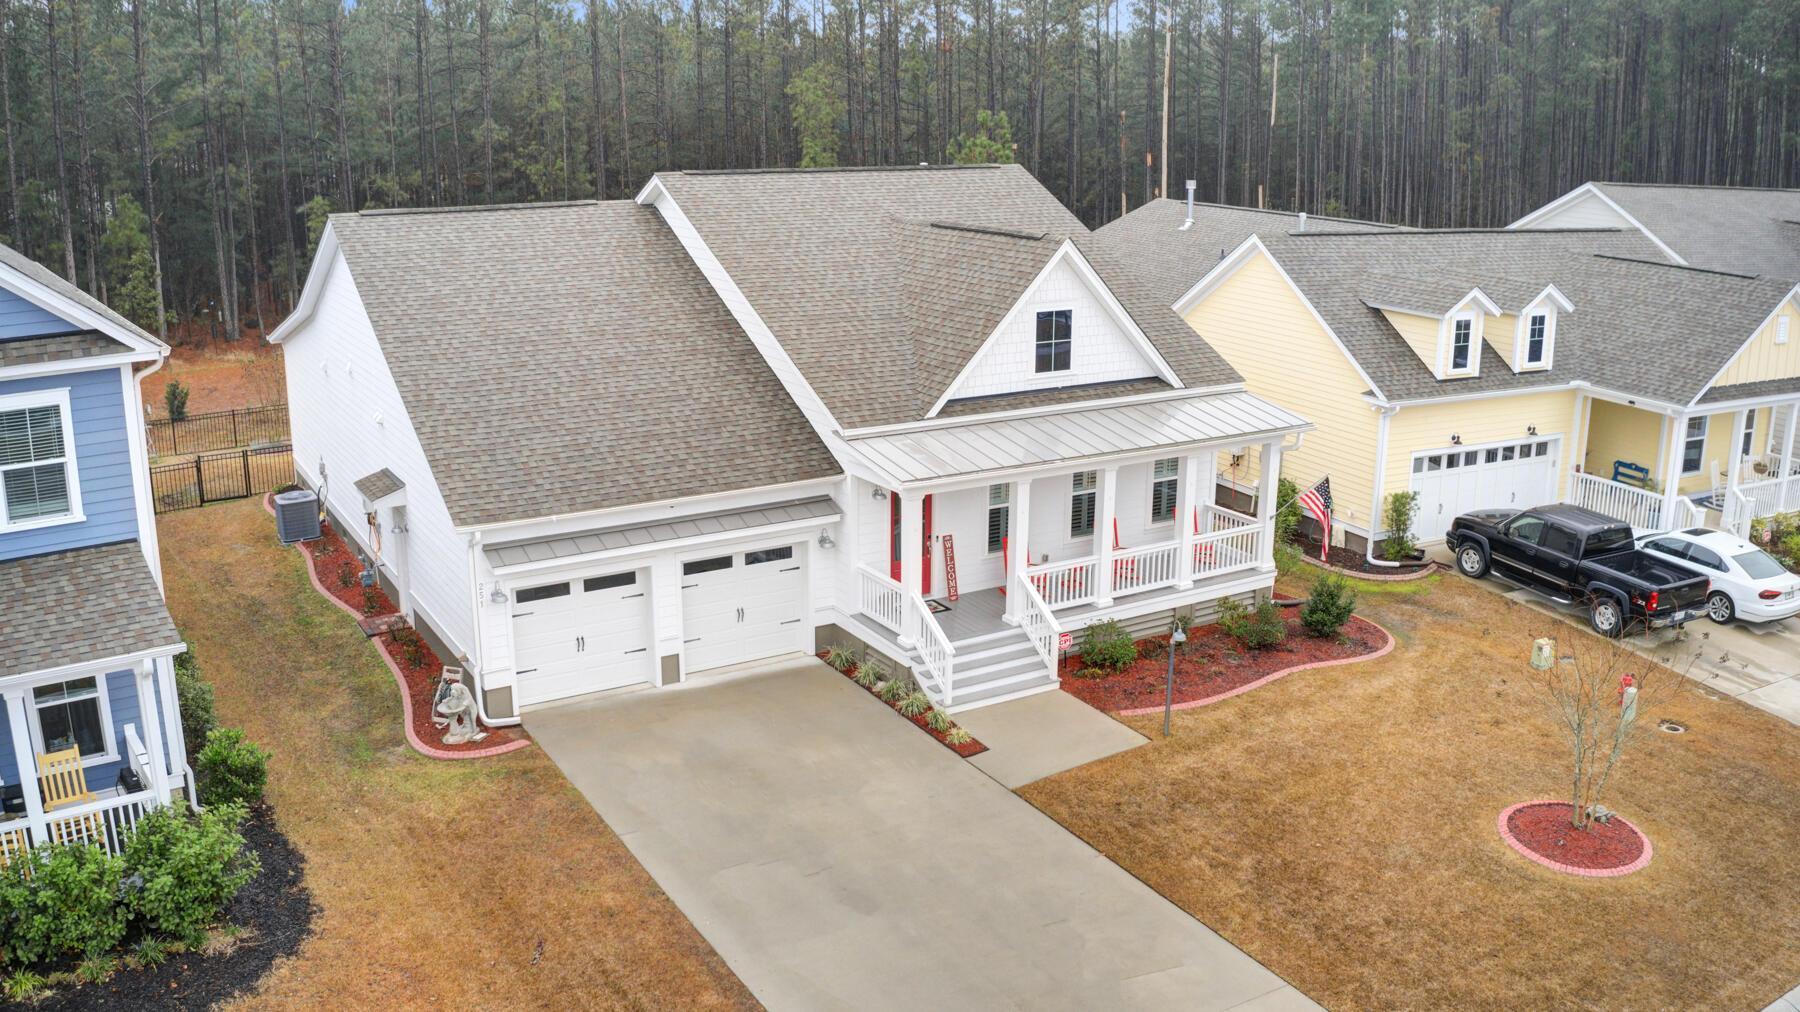 Cane Bay Plantation Homes For Sale - 251 Calm Water, Summerville, SC - 4